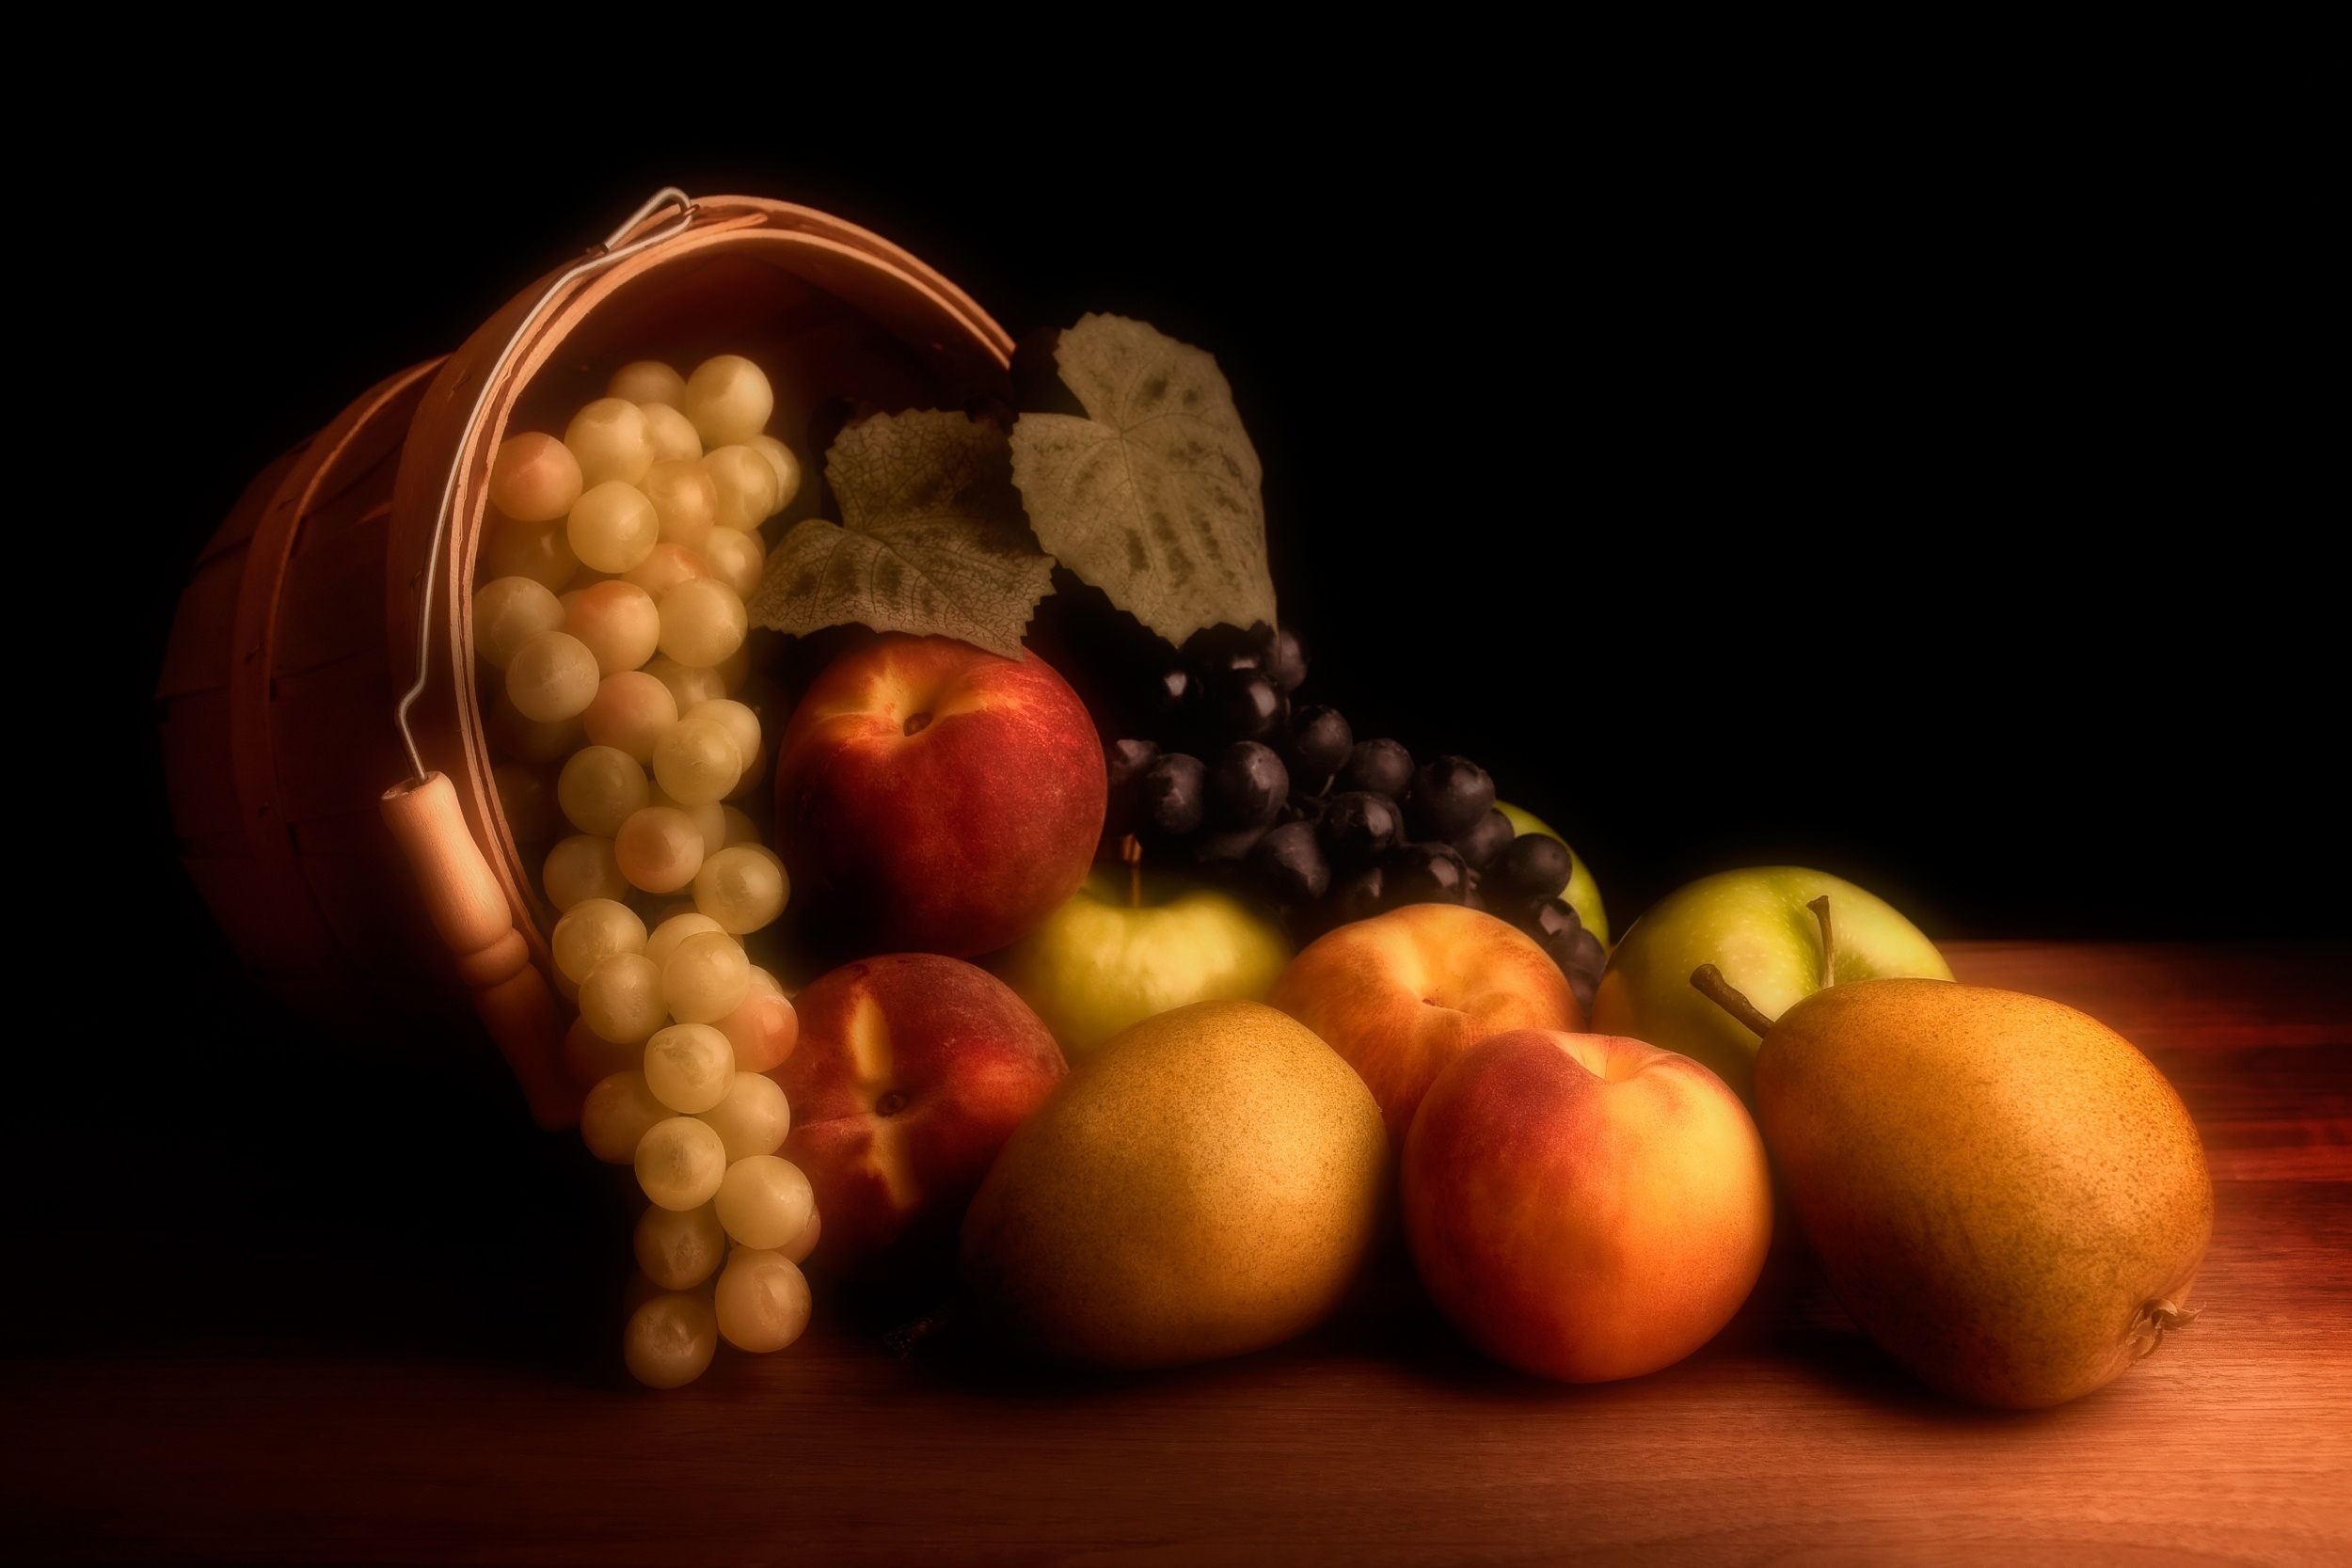 еда курица свечи виноград яблоки скачать